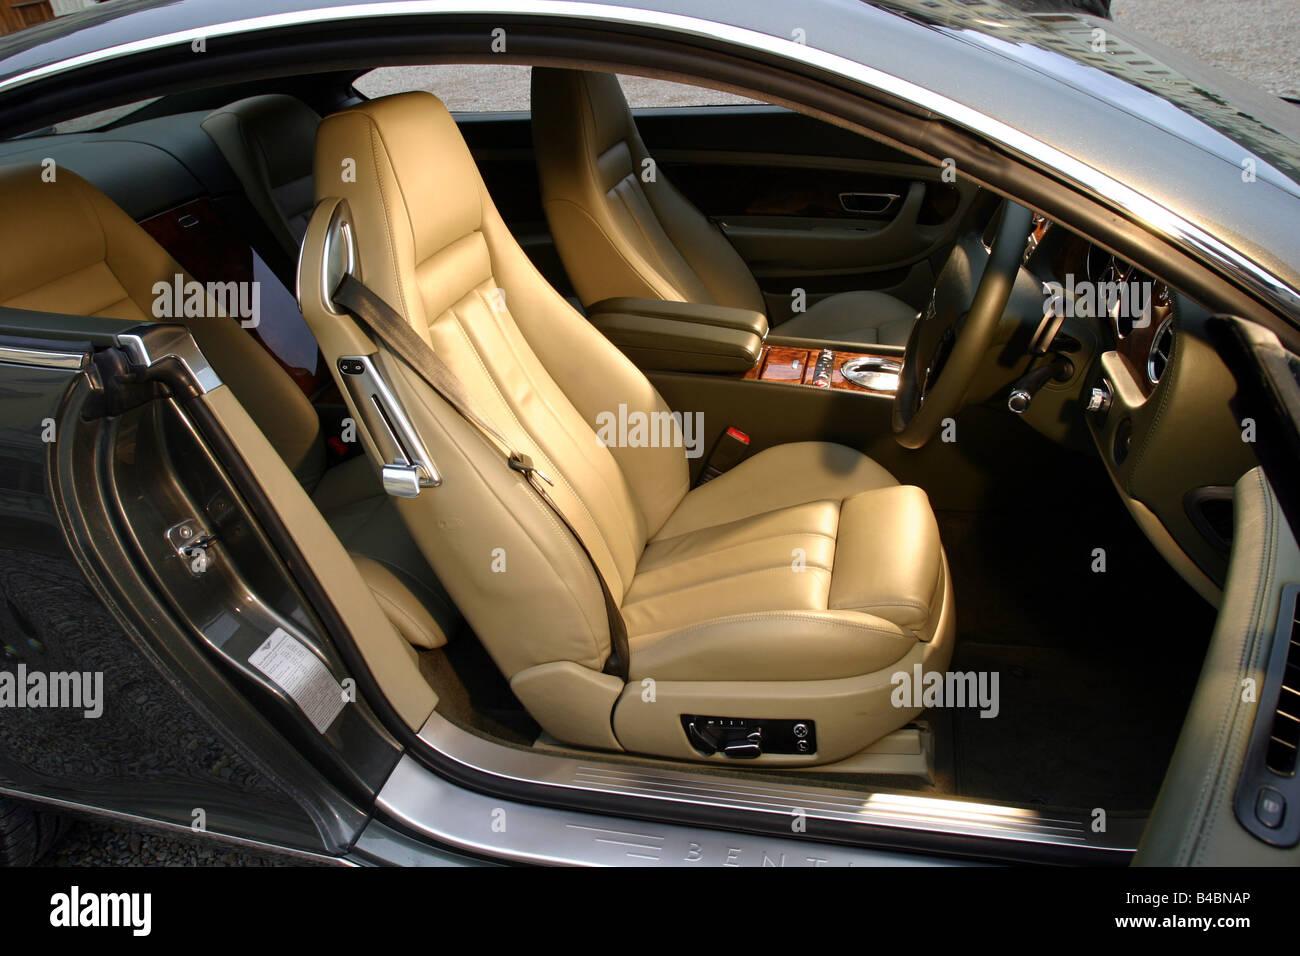 Car bentley continental gt luxury approxs model year 2003 car bentley continental gt luxury approxs model year 2003 vanachro Gallery